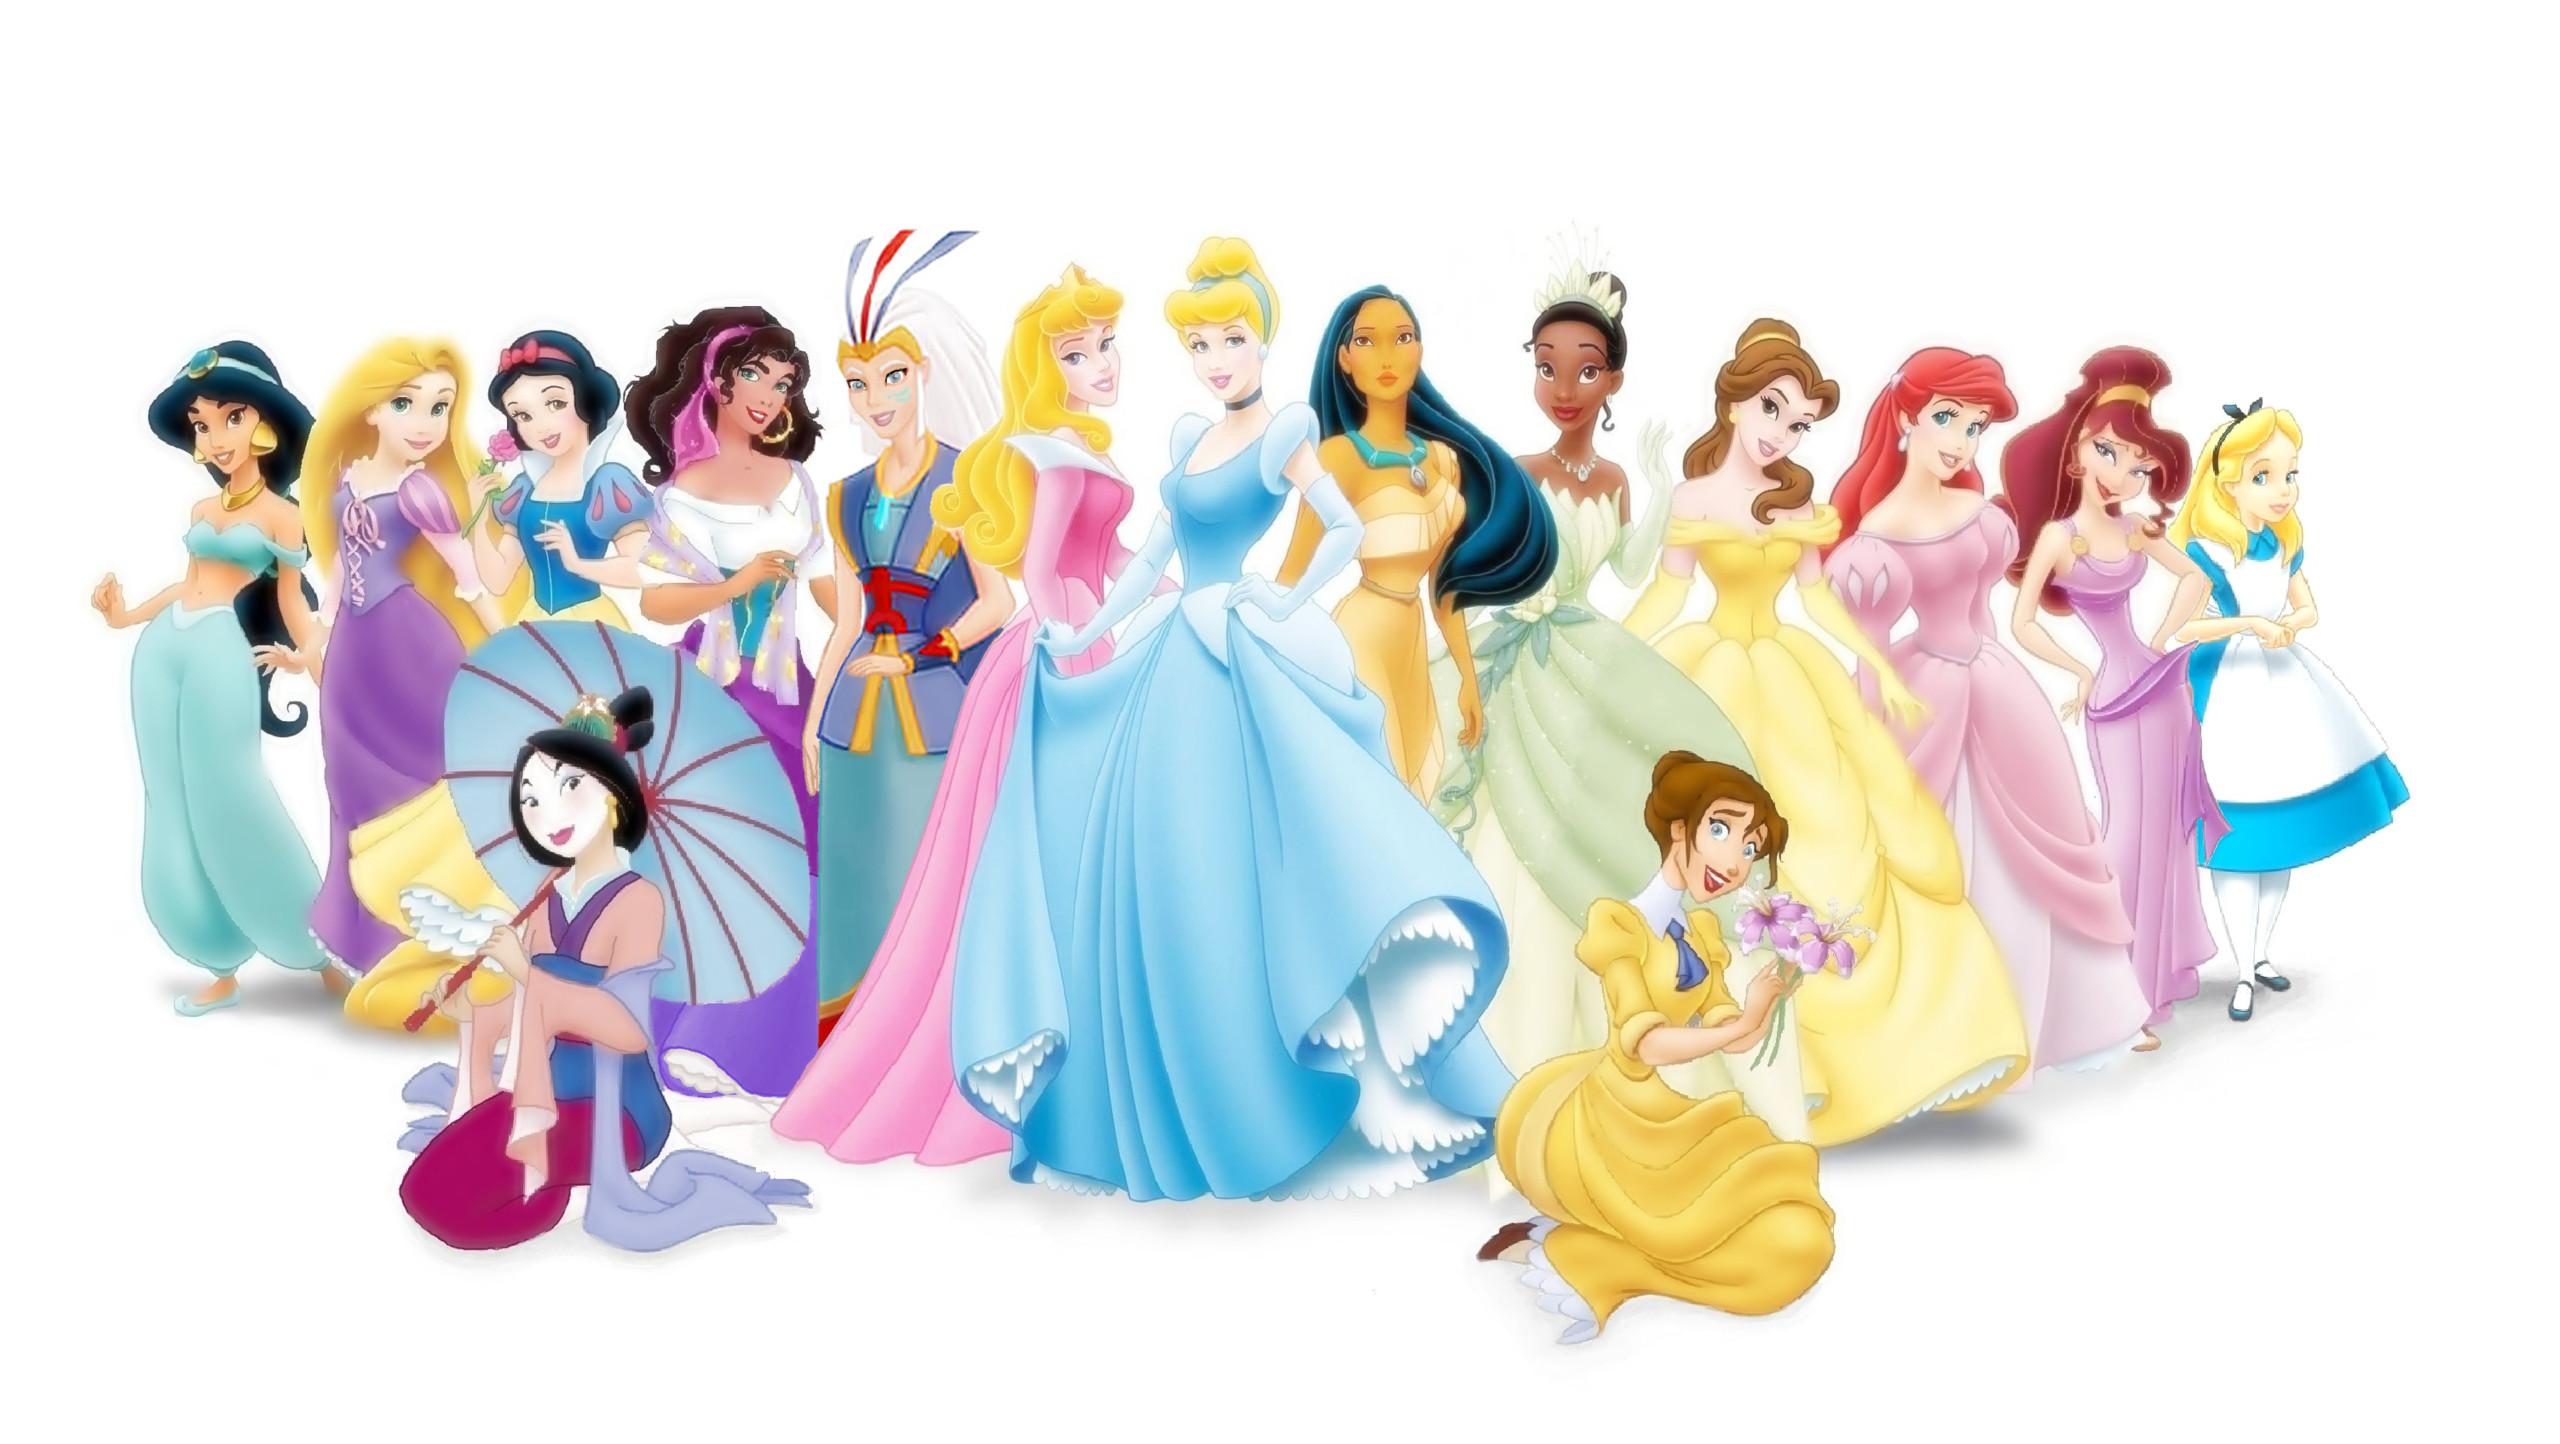 1920x1080 Walt Disney Princess Ariel HD Wallpaper